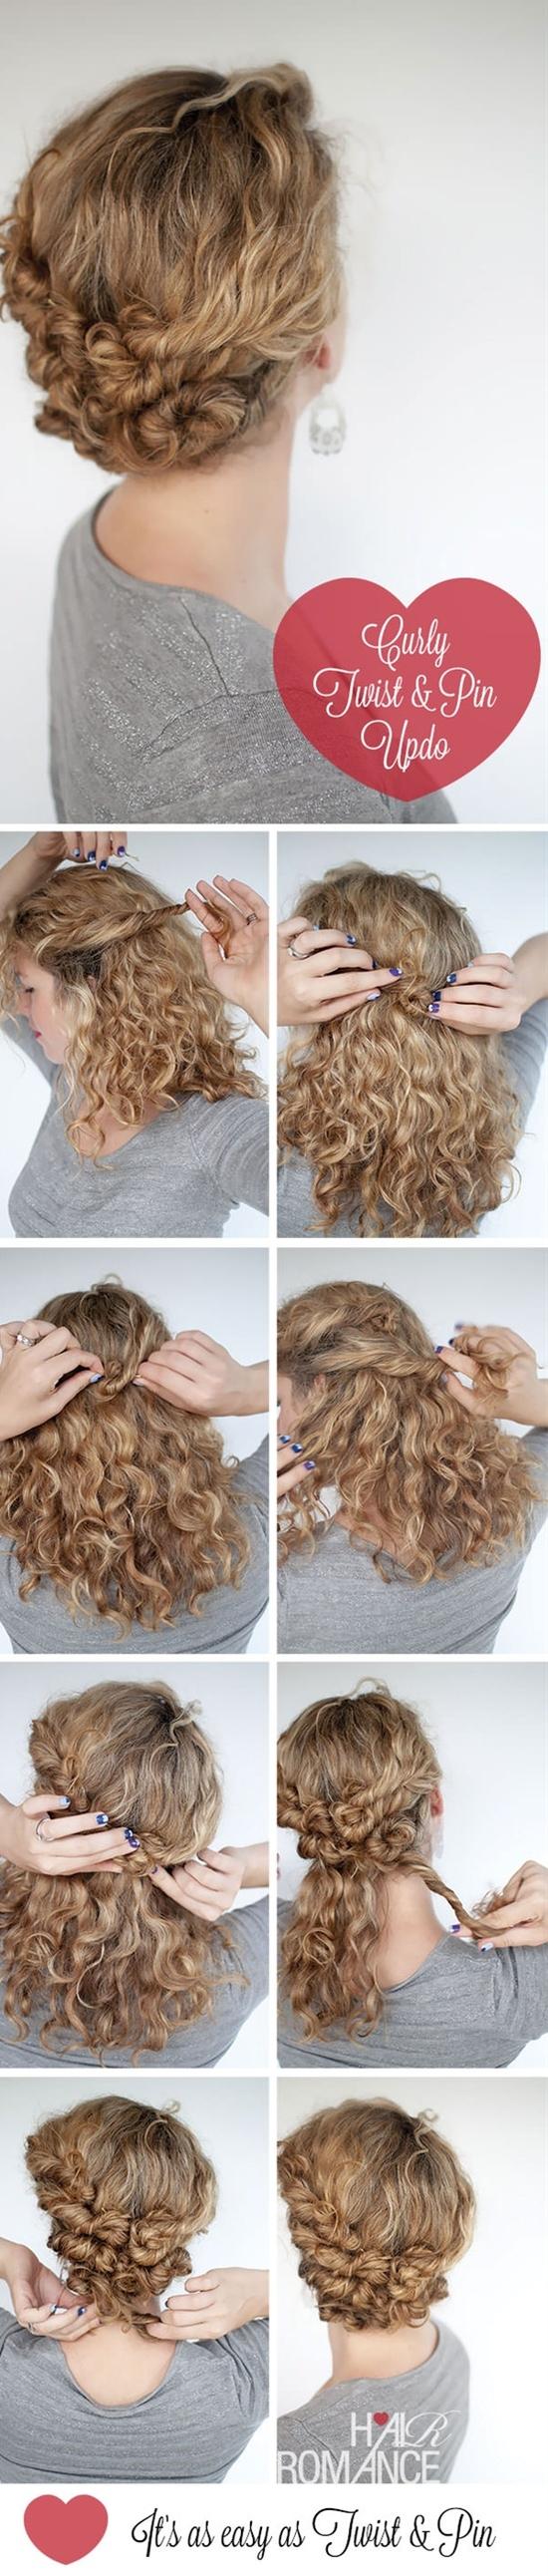 Twist and pin updo cute on curly hair hair pinterest hair